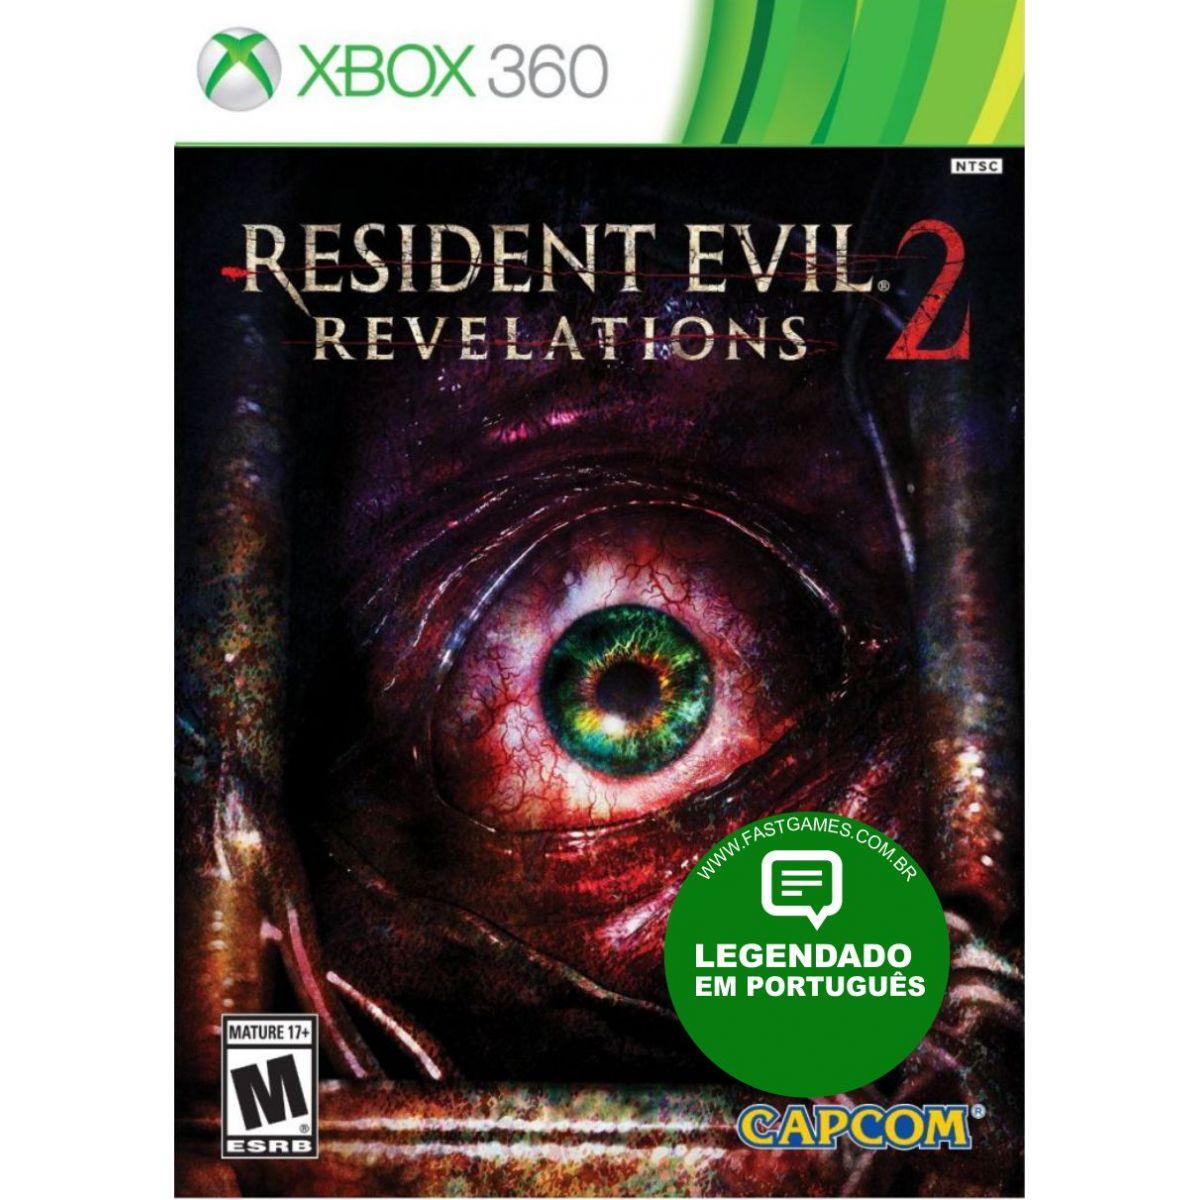 Resident Evil: Revelations 2 - XBOX 360  - FastGames - Gamers levados a sério